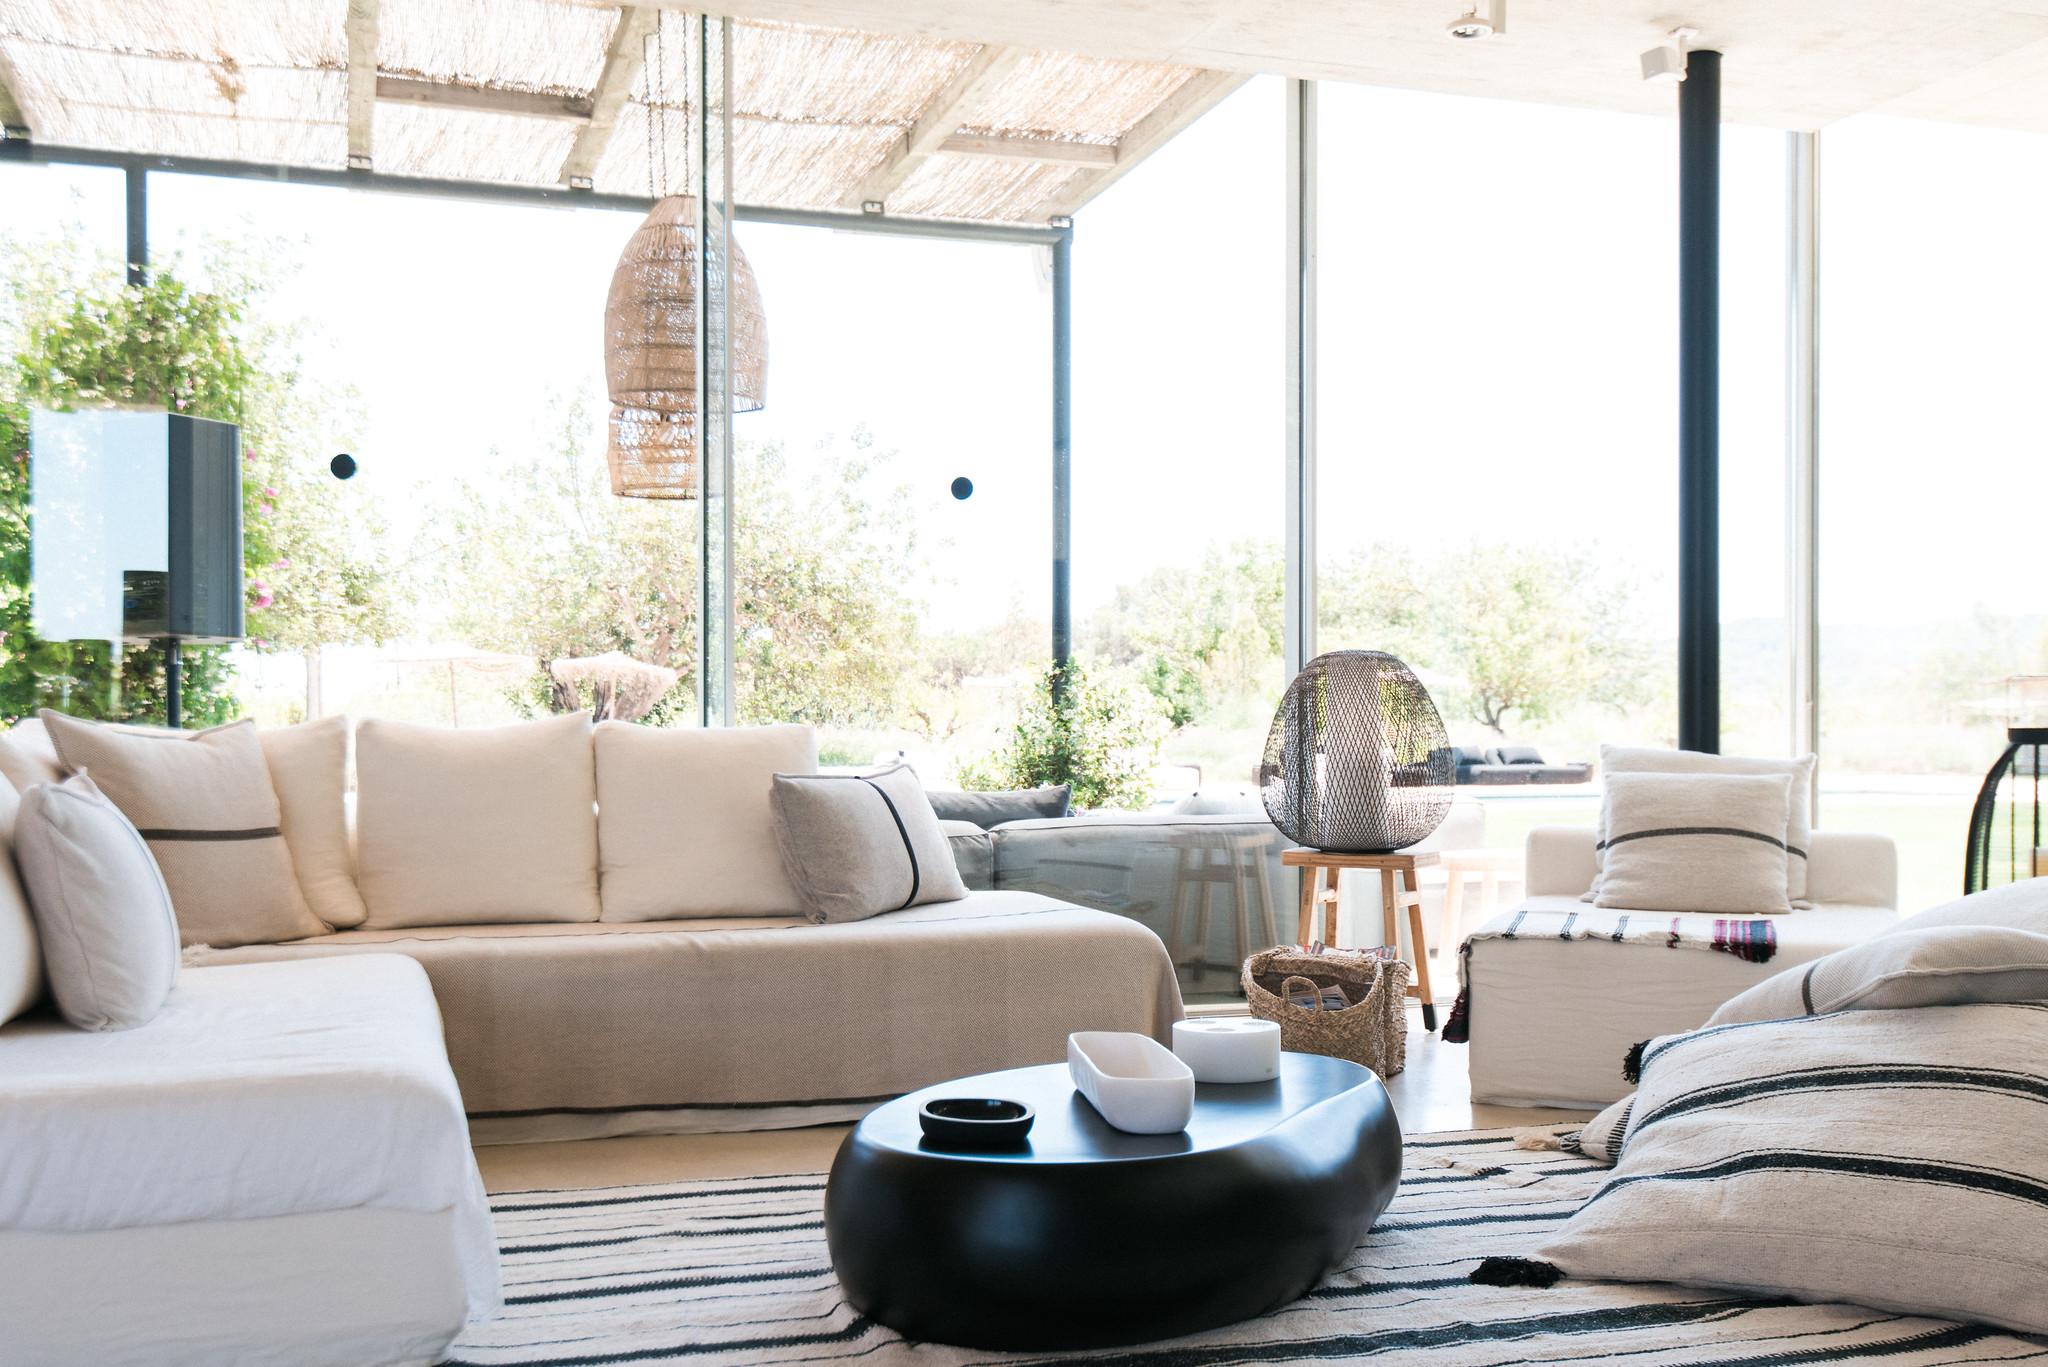 https://www.white-ibiza.com/wp-content/uploads/2020/06/white-ibiza-villas-casa-valentina-interior-living-room4.jpg